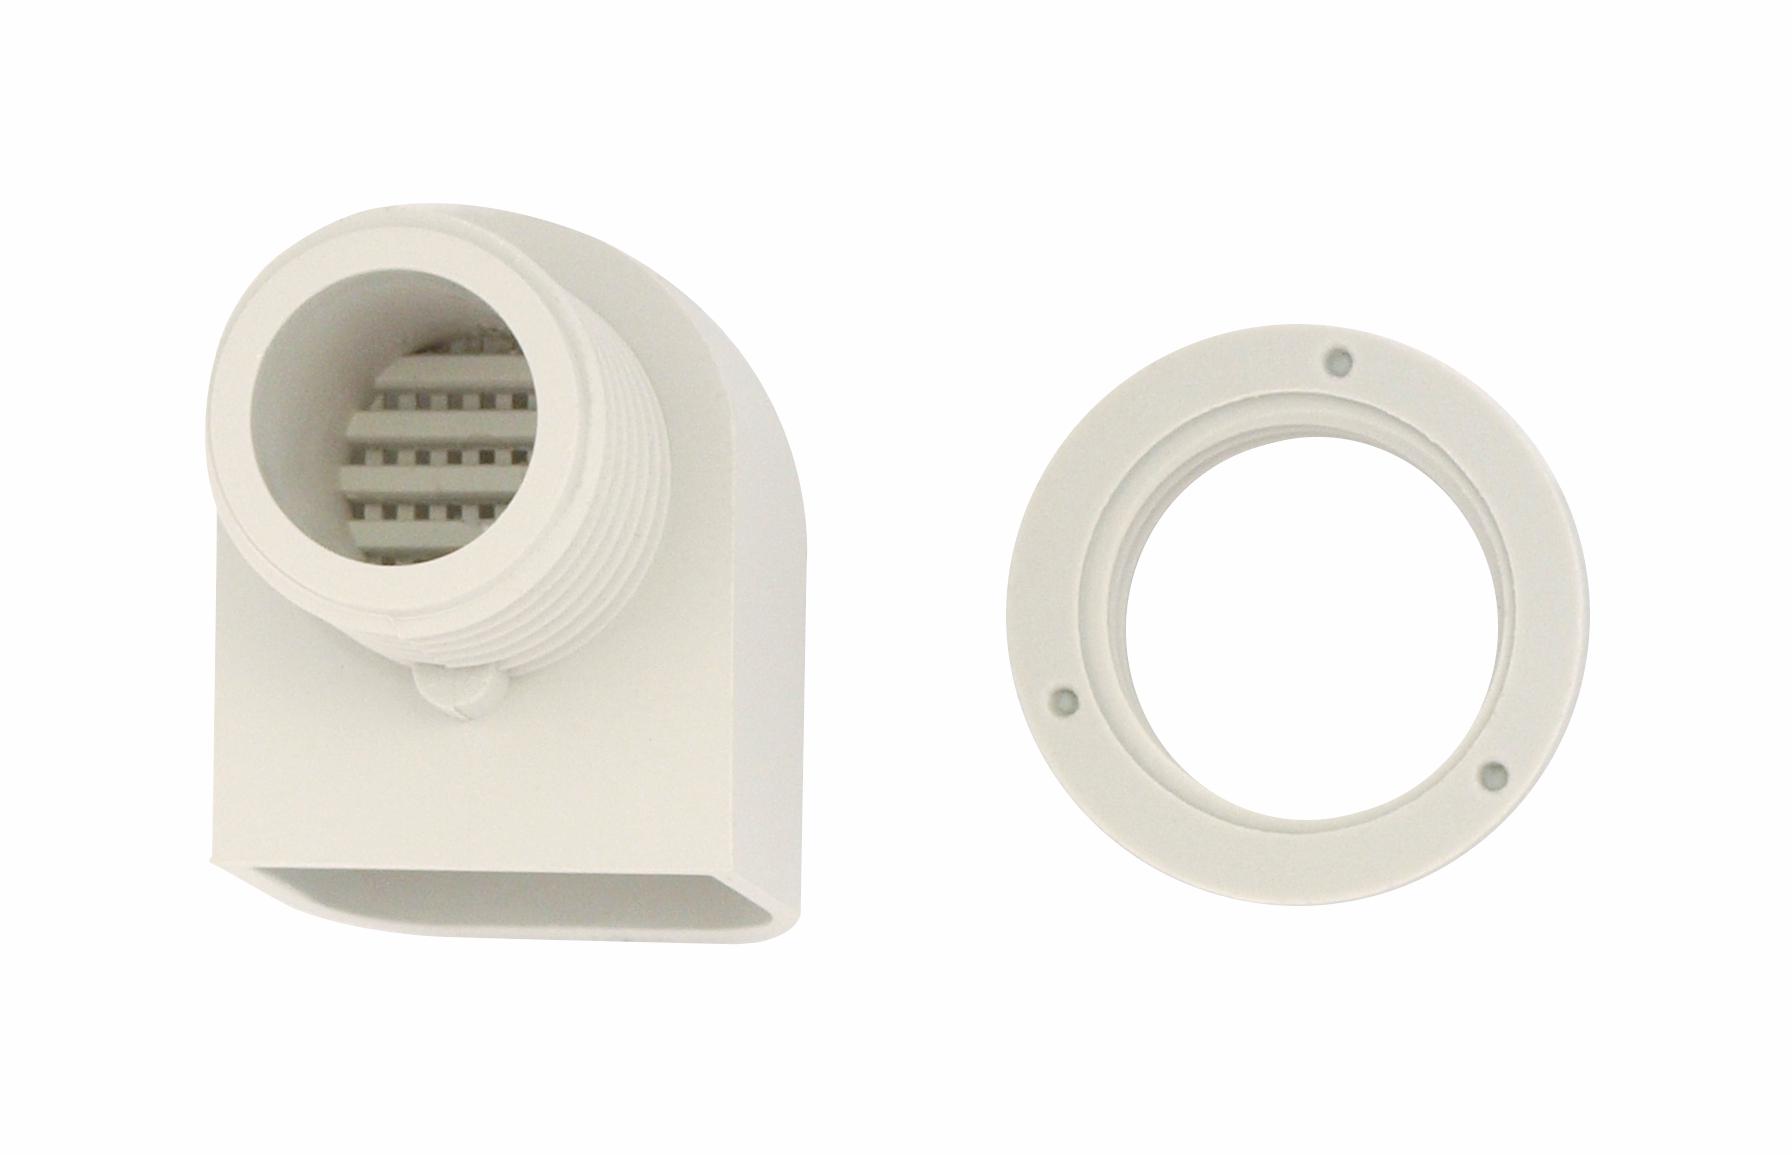 1 Stk Ventilatorverschraubung klein RAL7030 IMDV0000--